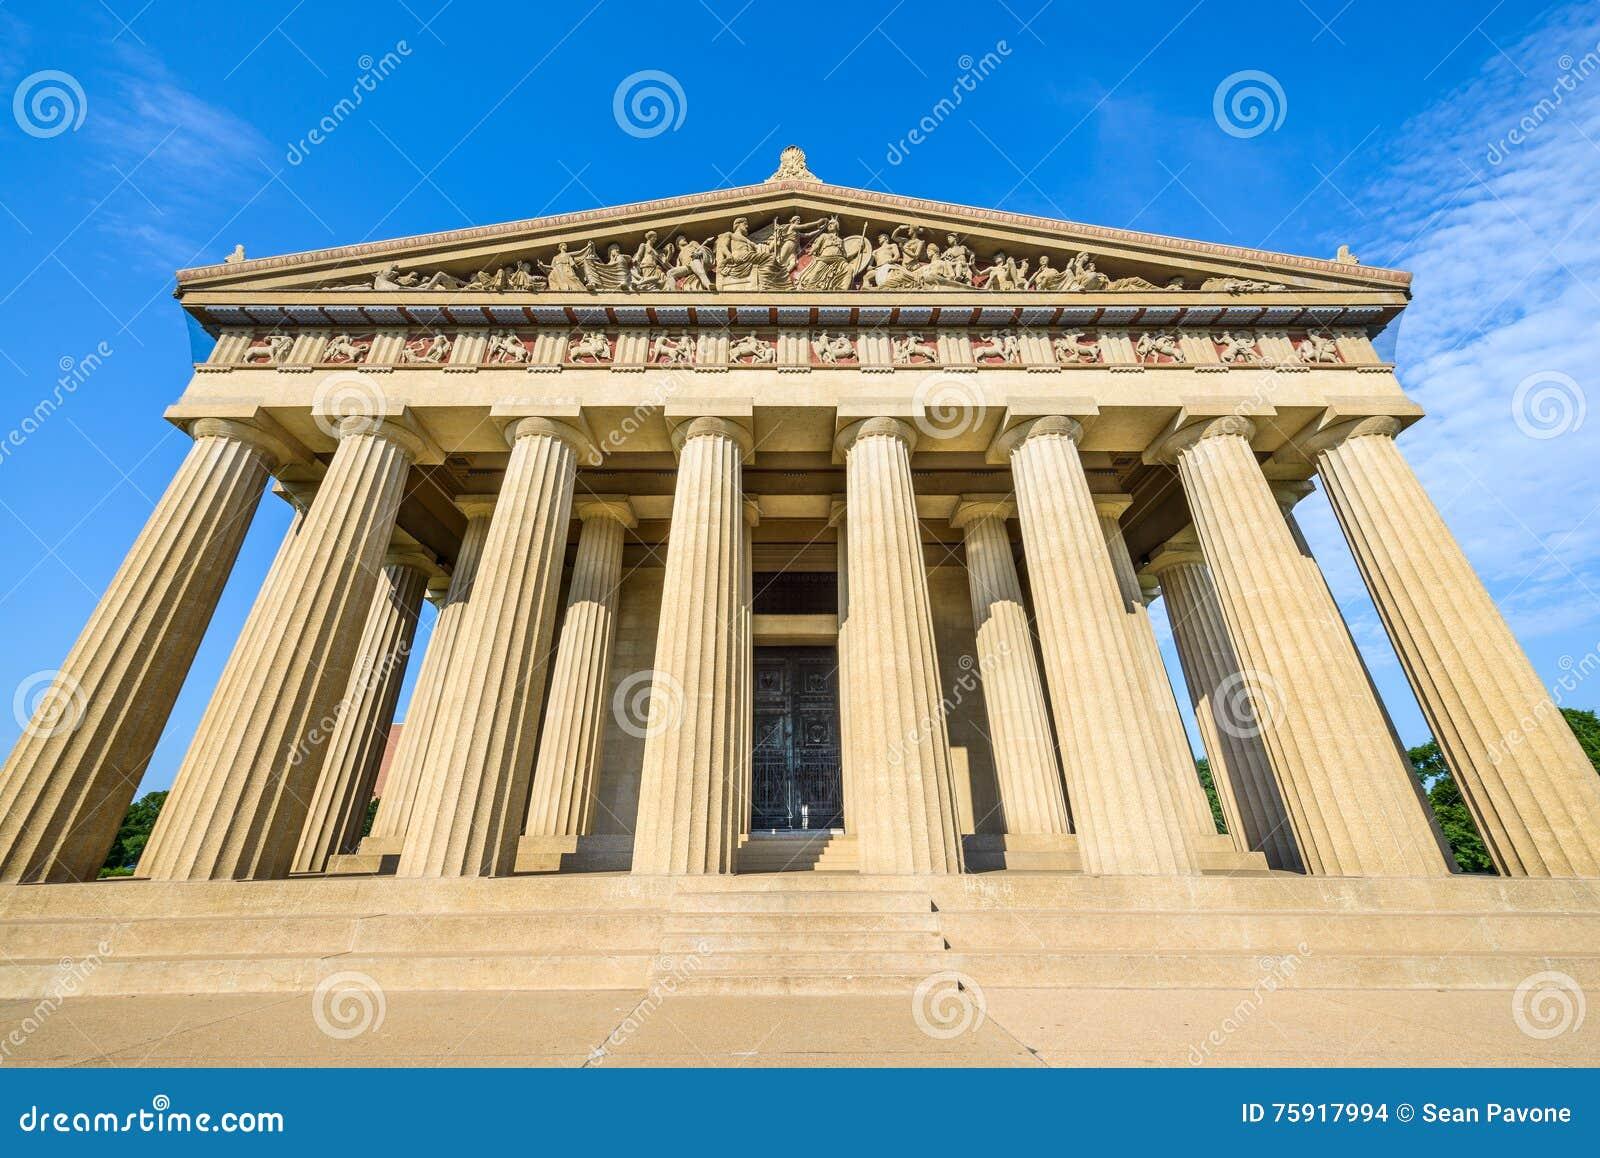 Partheon Replica In Nashville Stock Photo - Image: 75917994